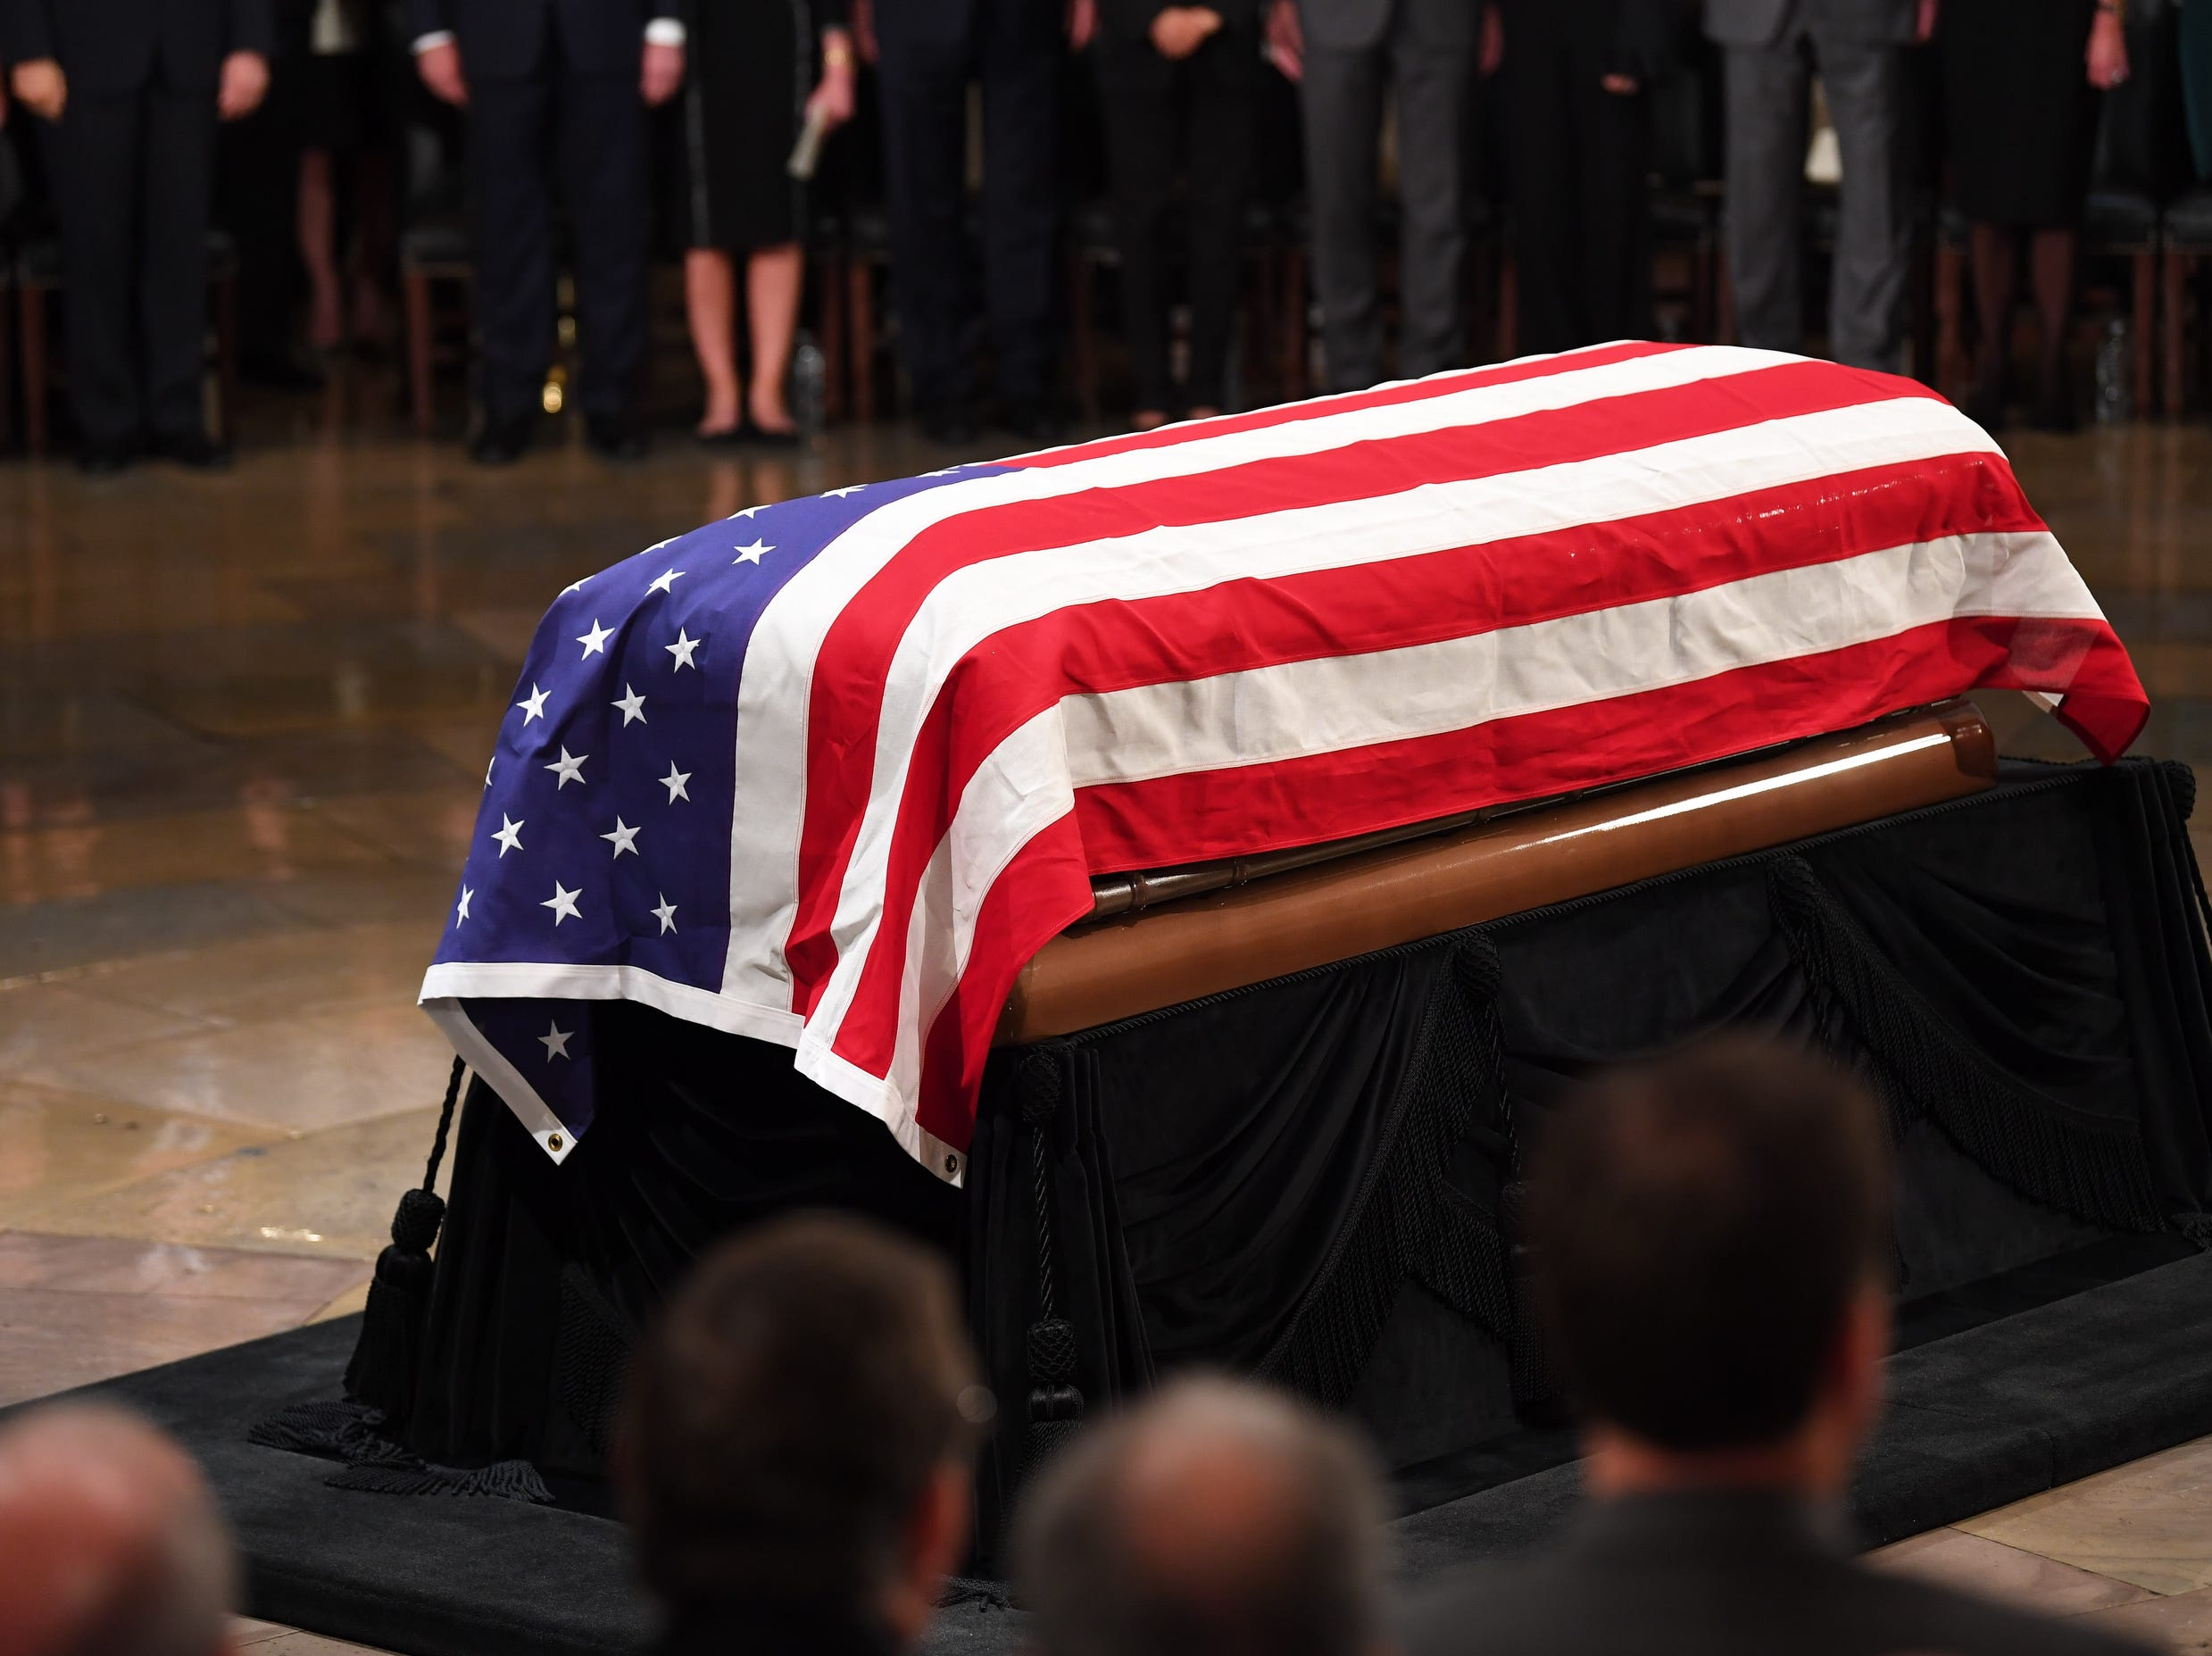 Former President George H.W. Bush lies in state at the U.S. Capitol Rotunda in Washington, Dec. 3, 2018.